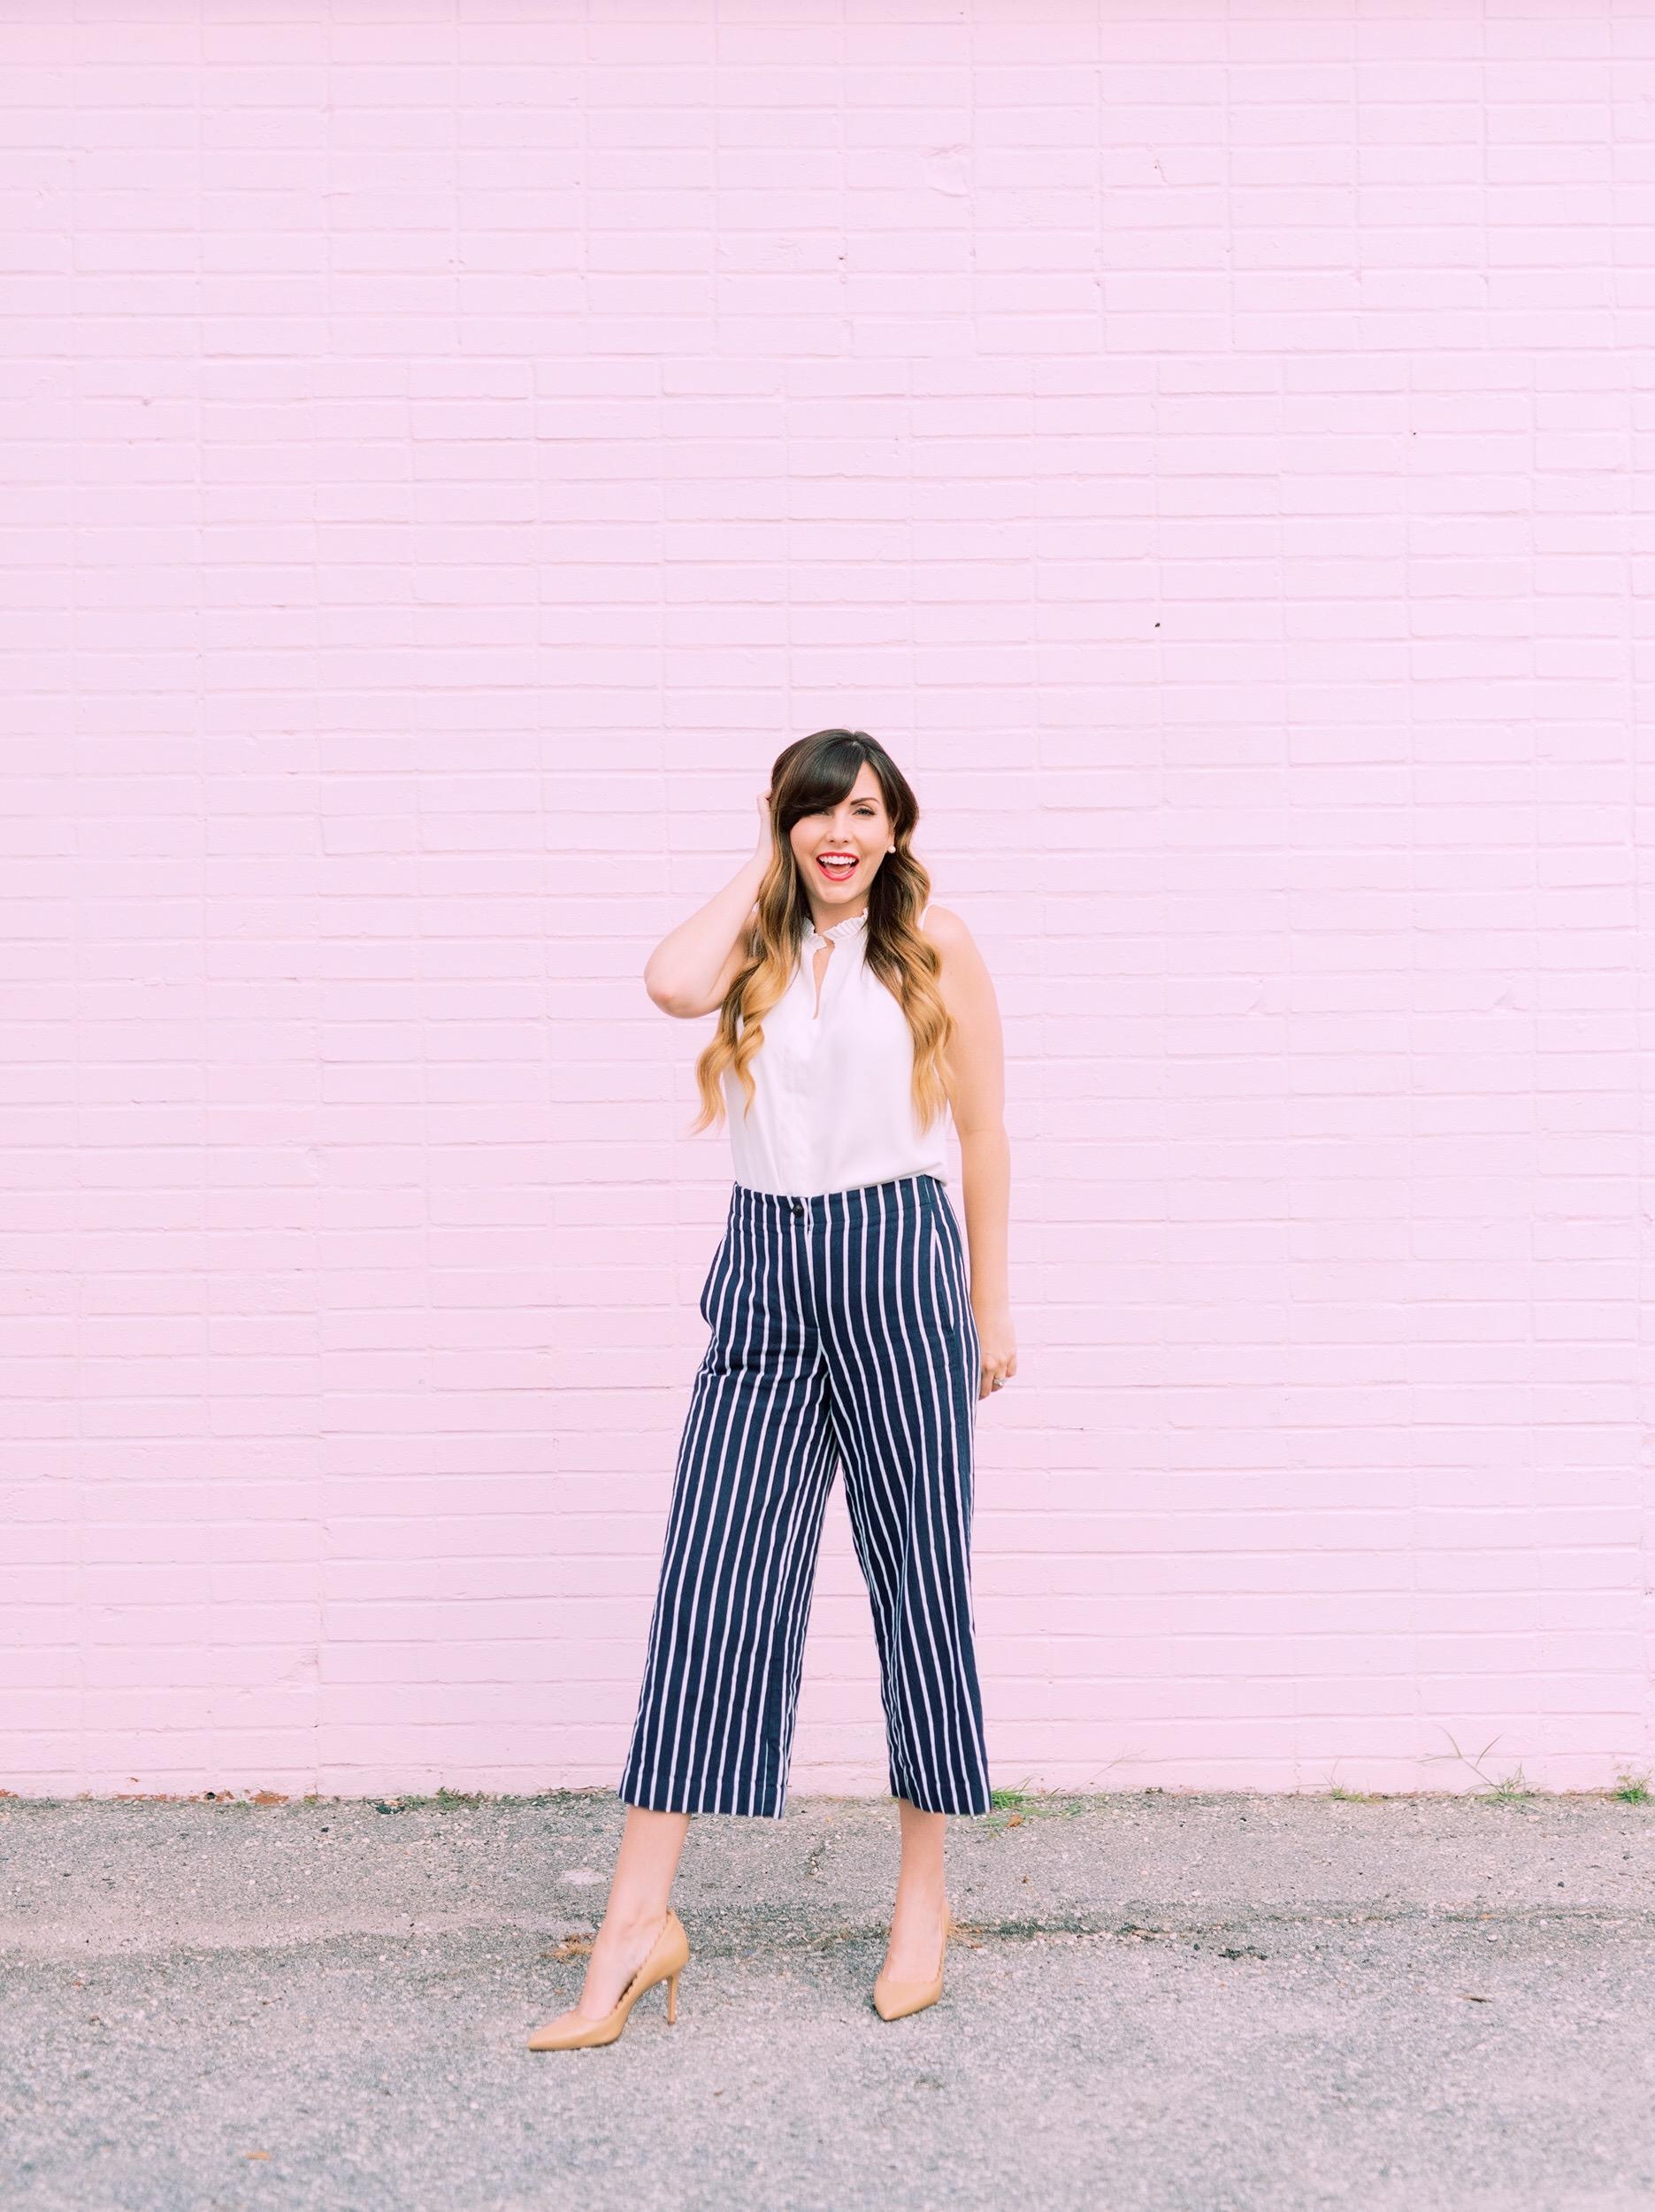 Striped Sale work pants modern woman.JPG